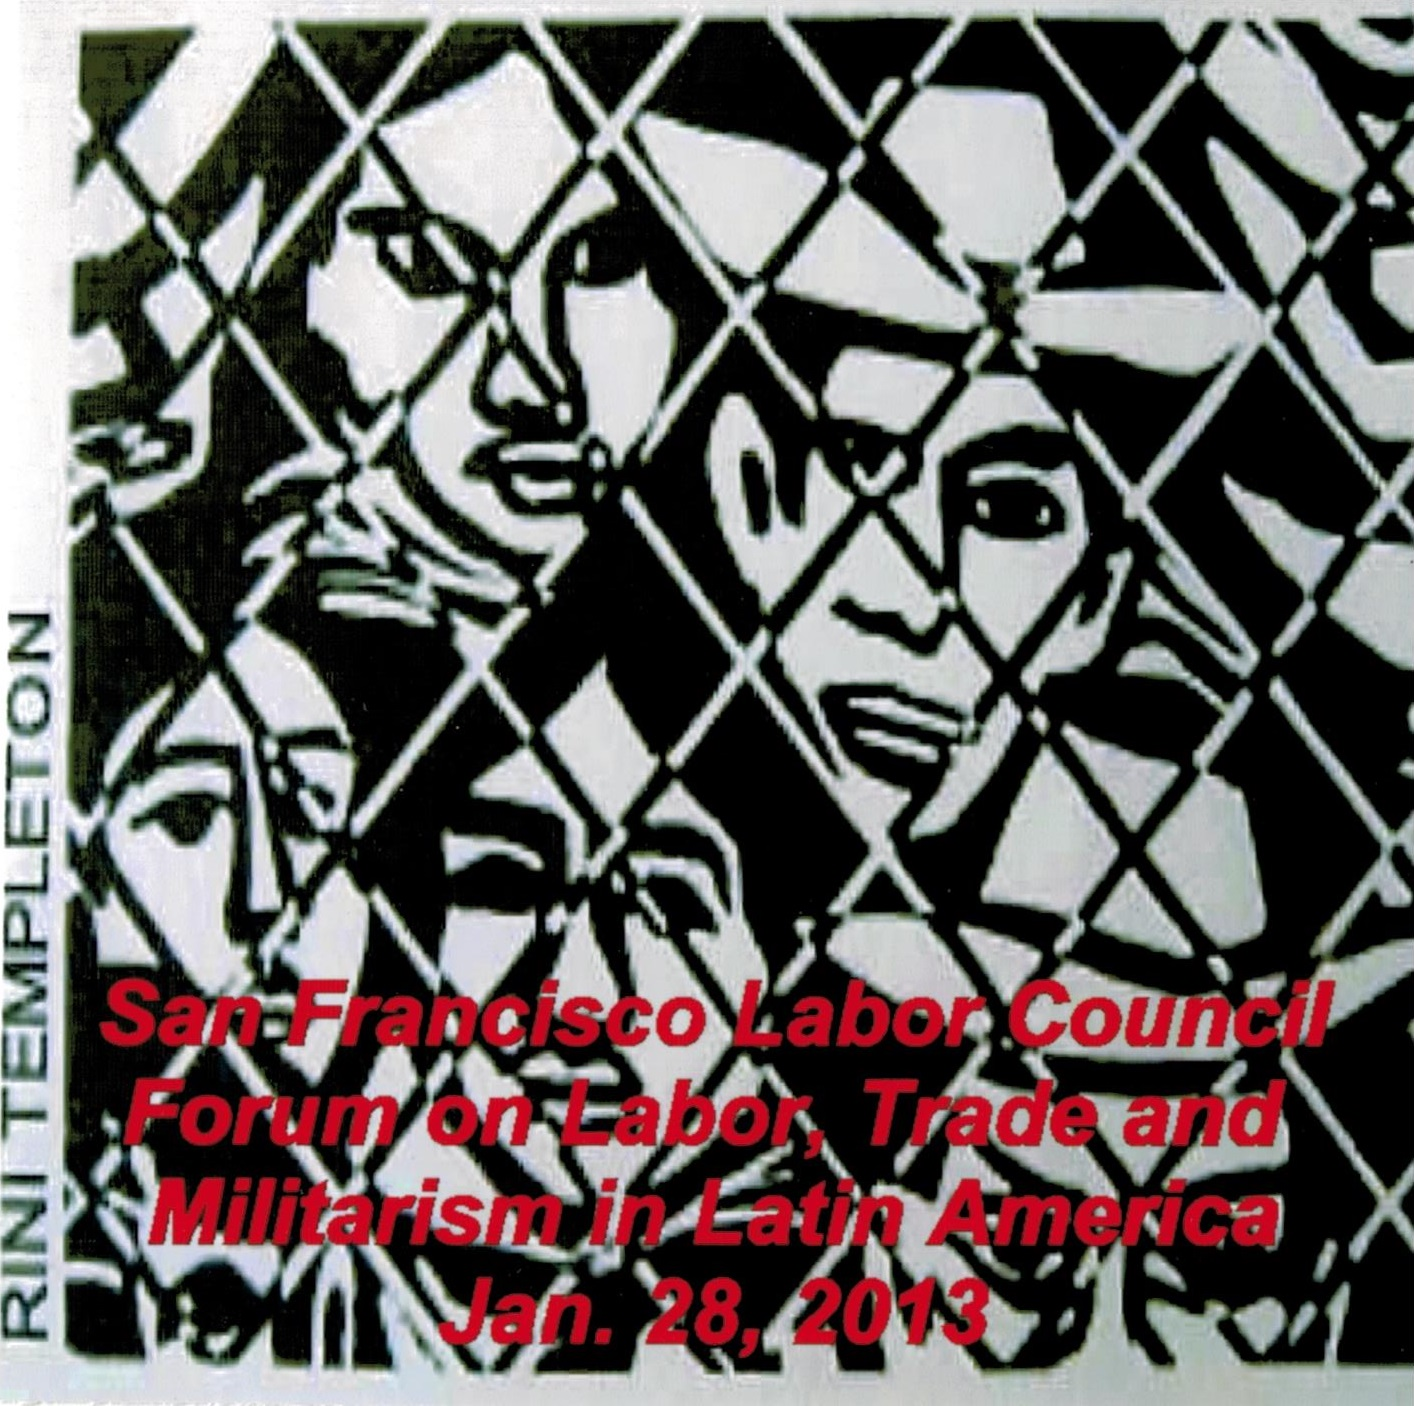 San Francisco Labor Council Forum on Labor, Trade, and Militarism in Latin America